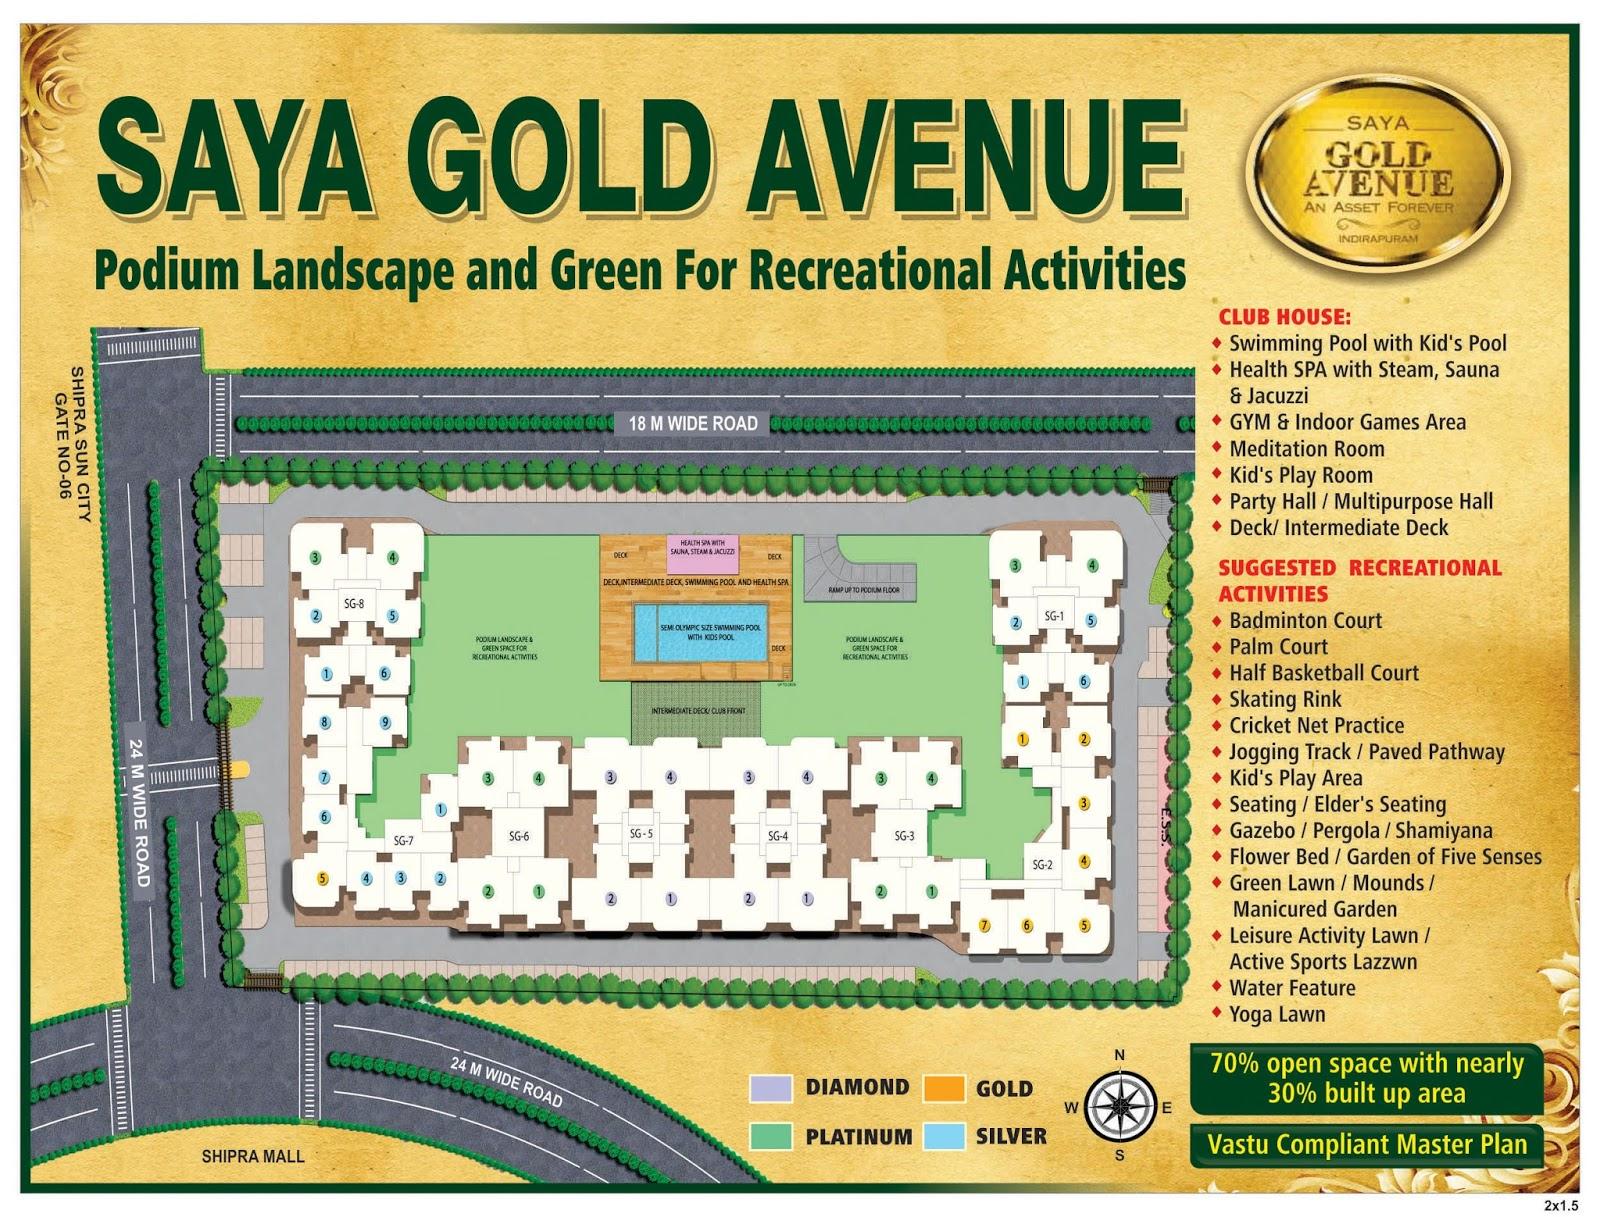 saya-gold-avenue-layout-plan